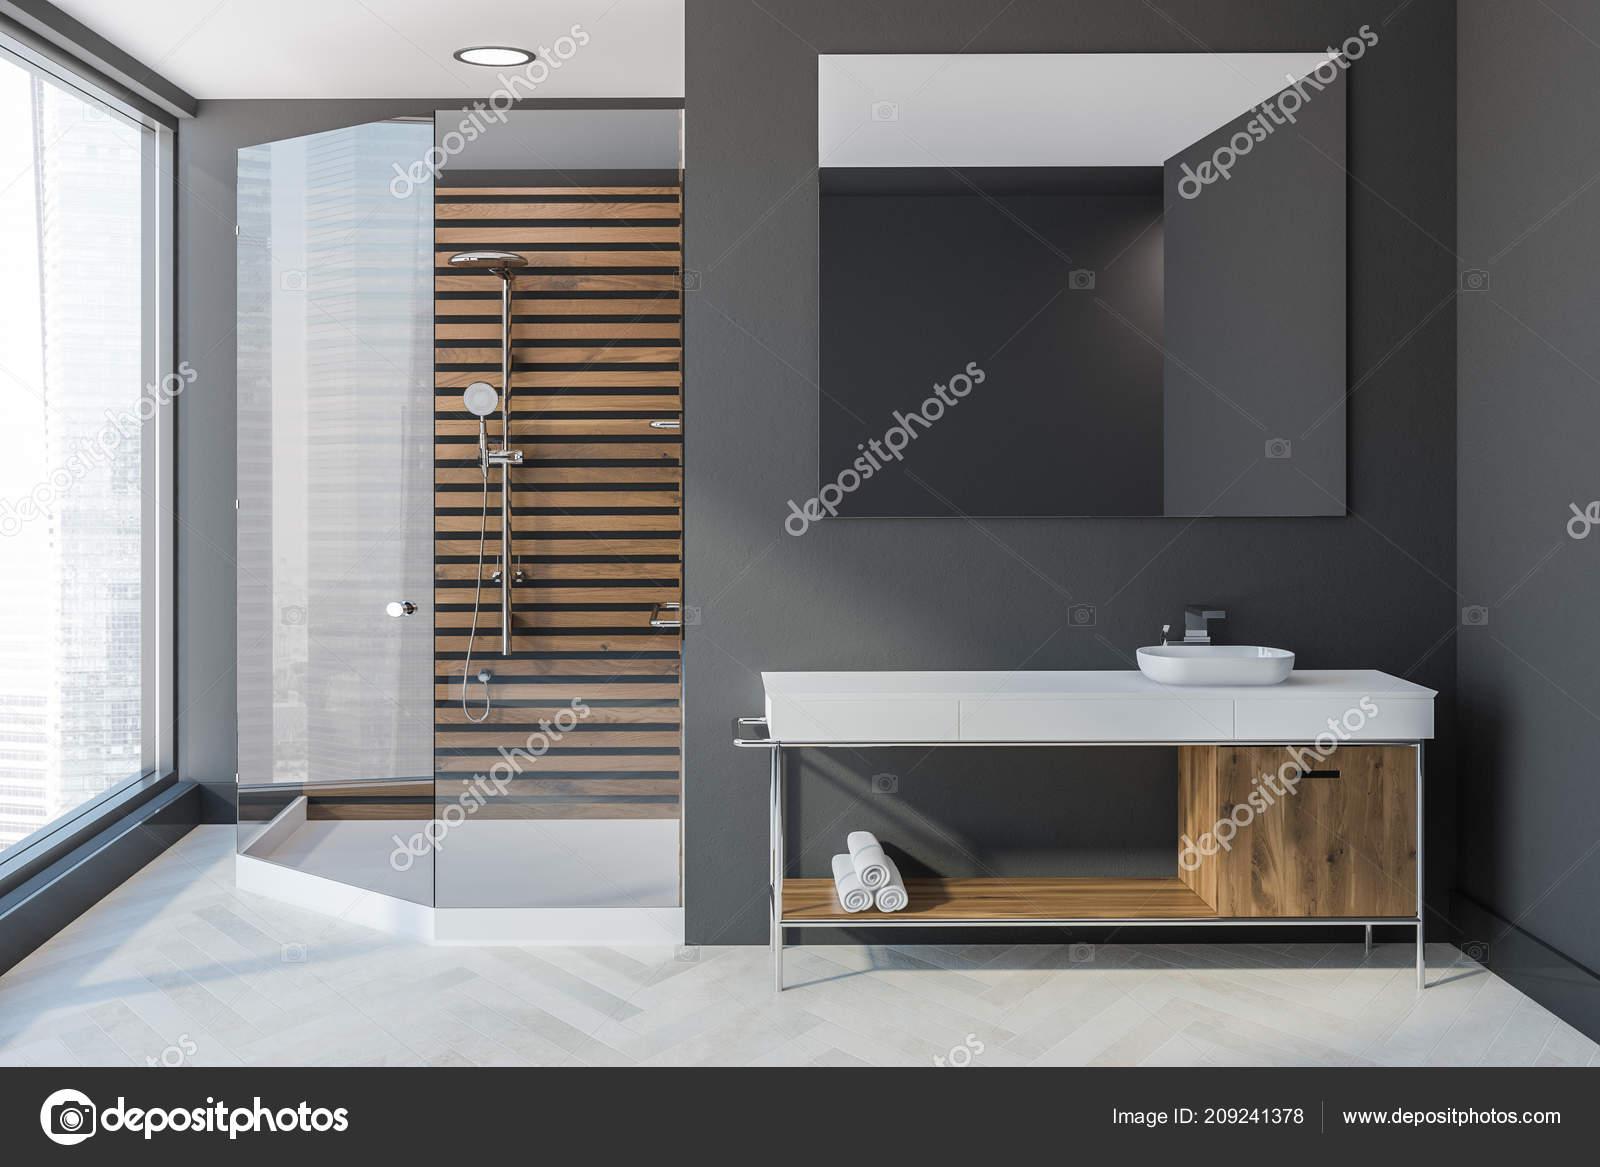 Scandinavian Style Bathroom Interior Grey Walls White Wooden Floor on